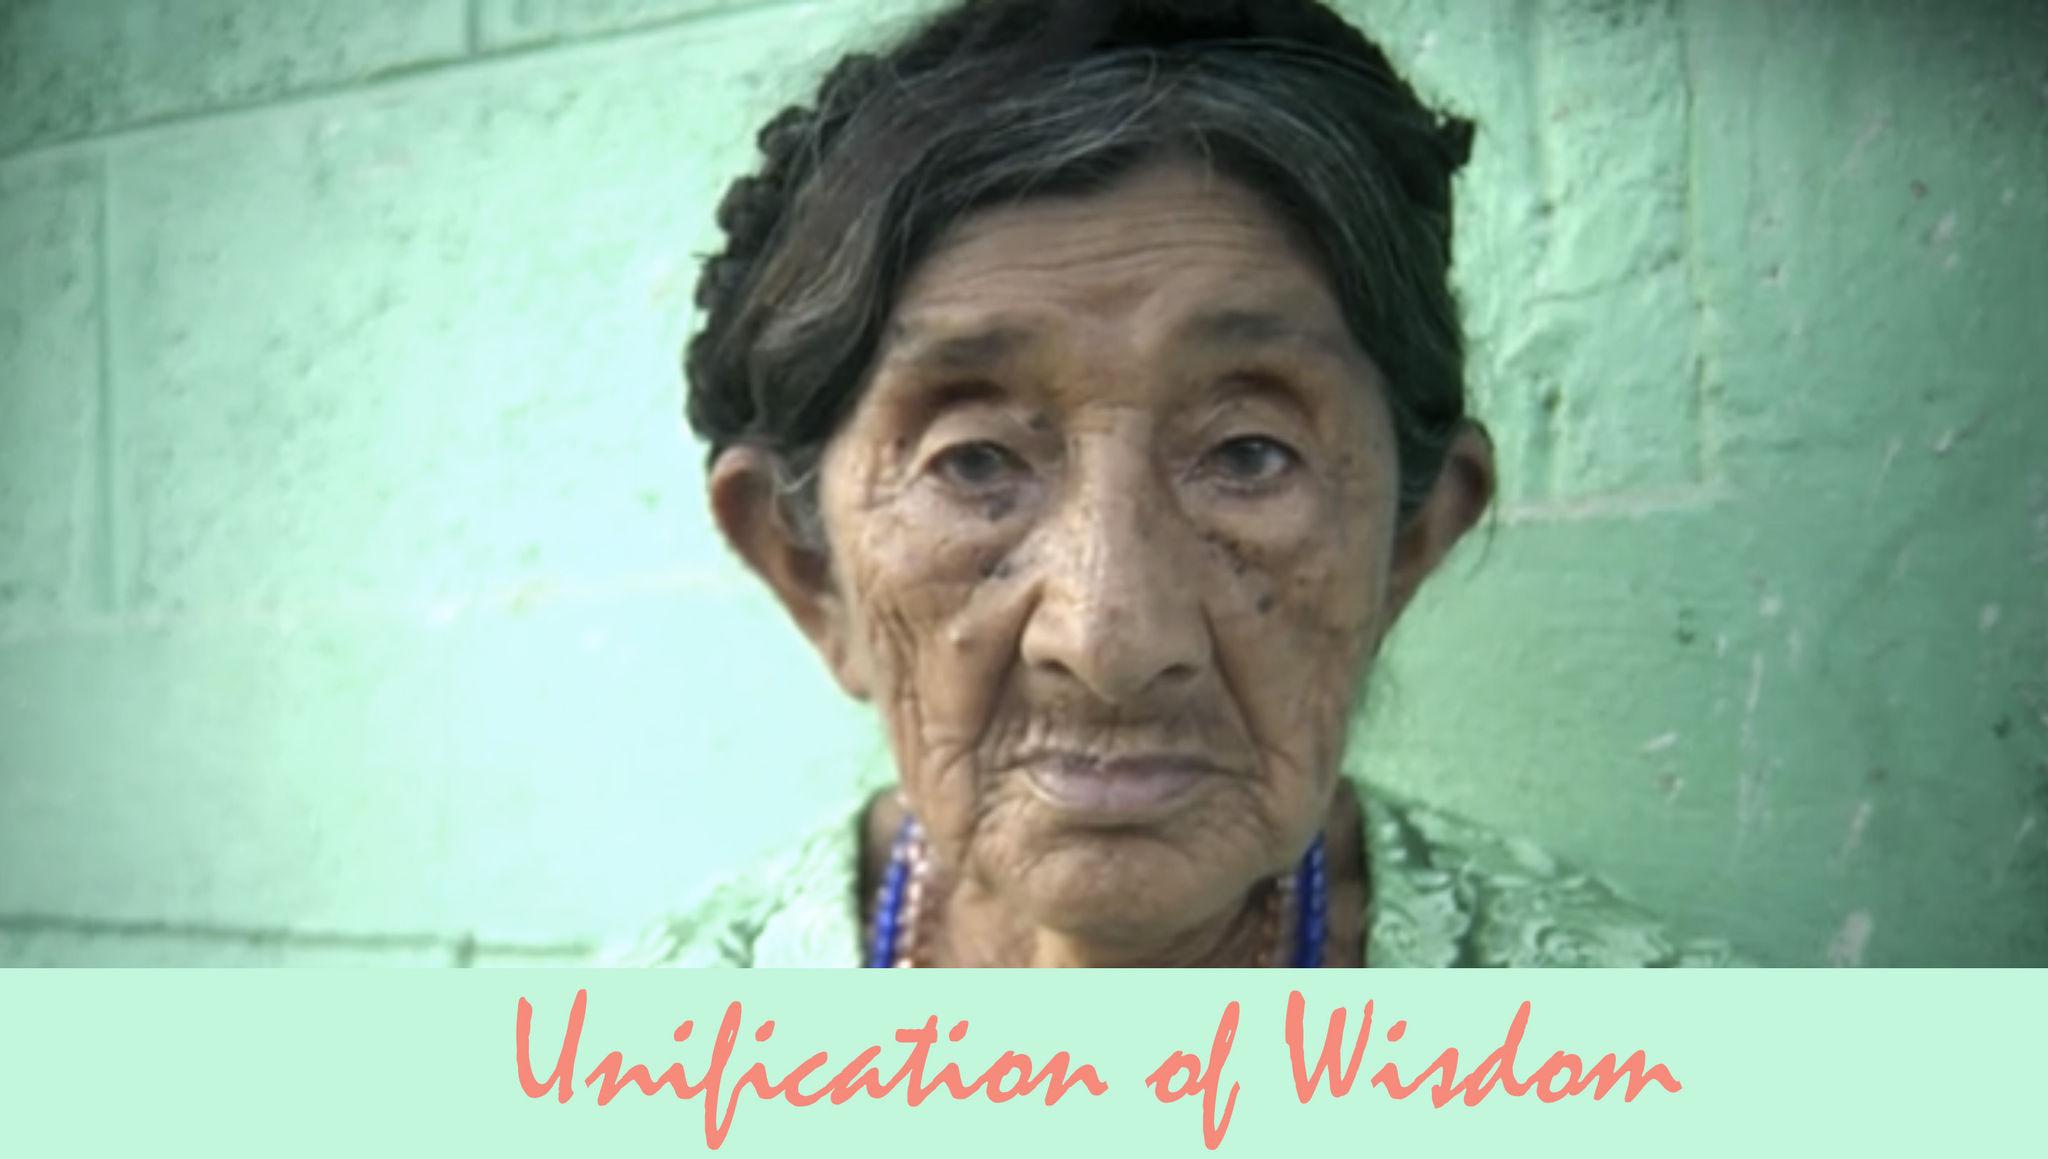 GuateMaya: The Unification of Wisdom